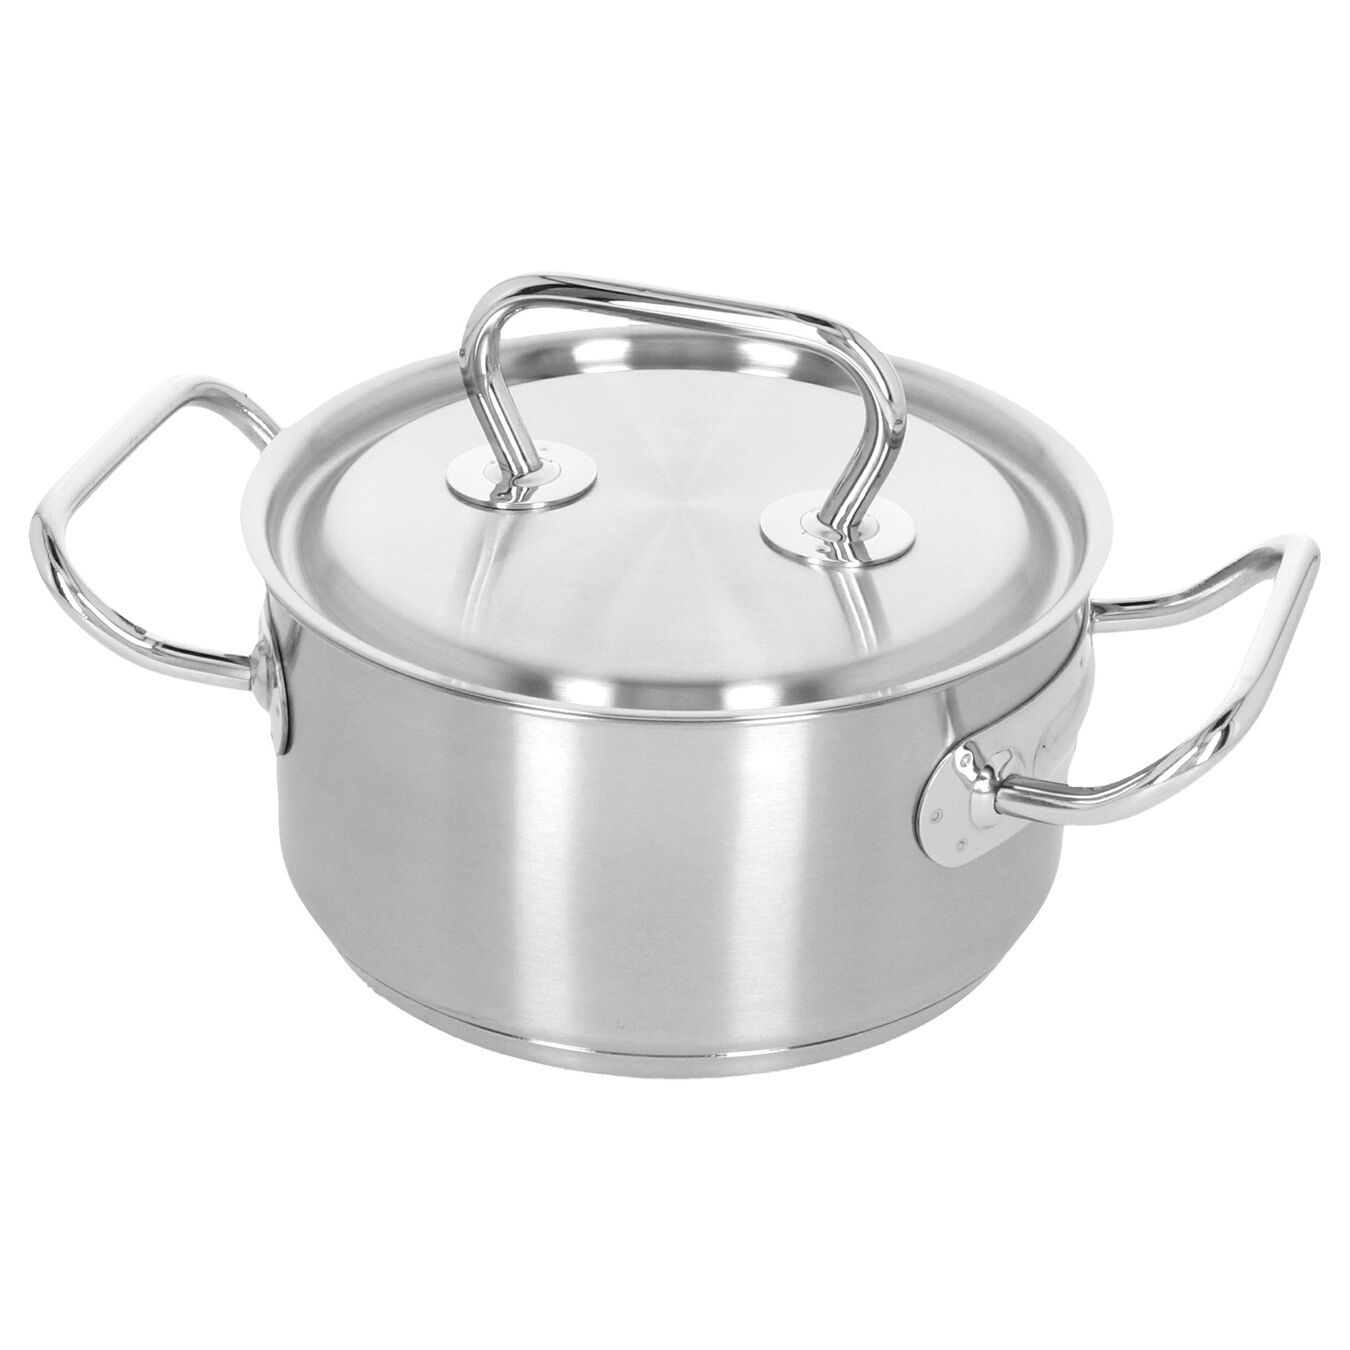 Kookpot met deksel 16 cm / 1,5 l,,large 2